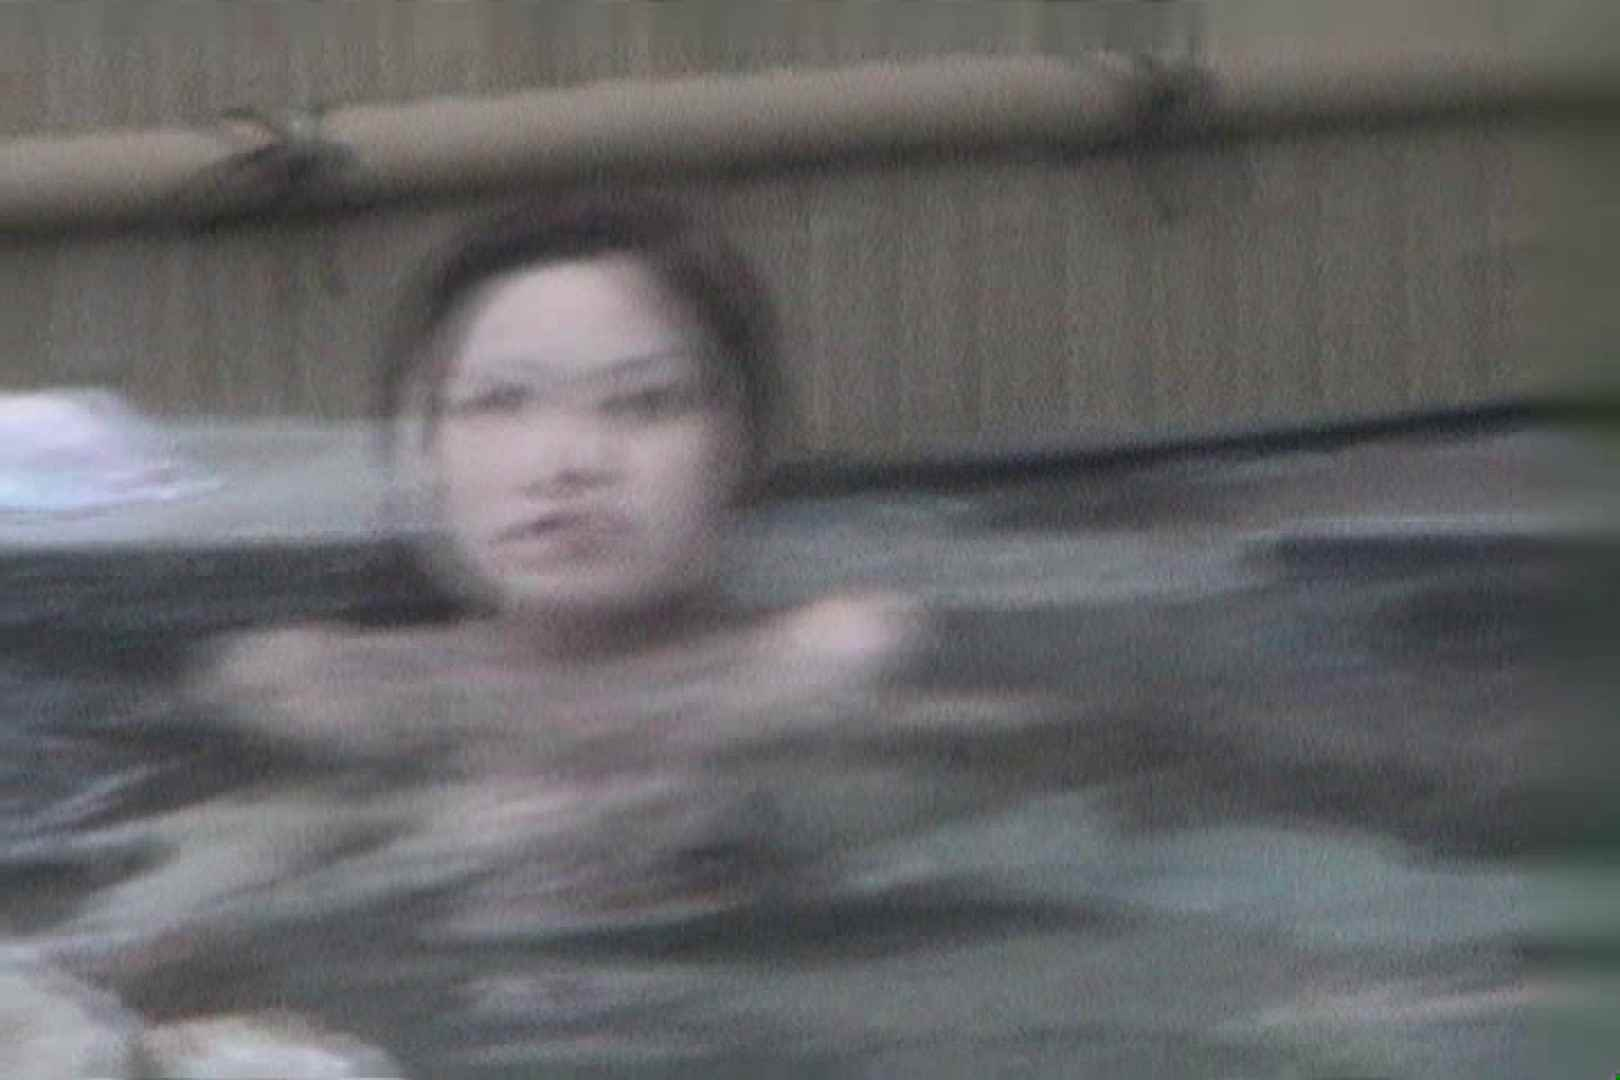 Aquaな露天風呂Vol.602 盗撮師作品  98pic 39